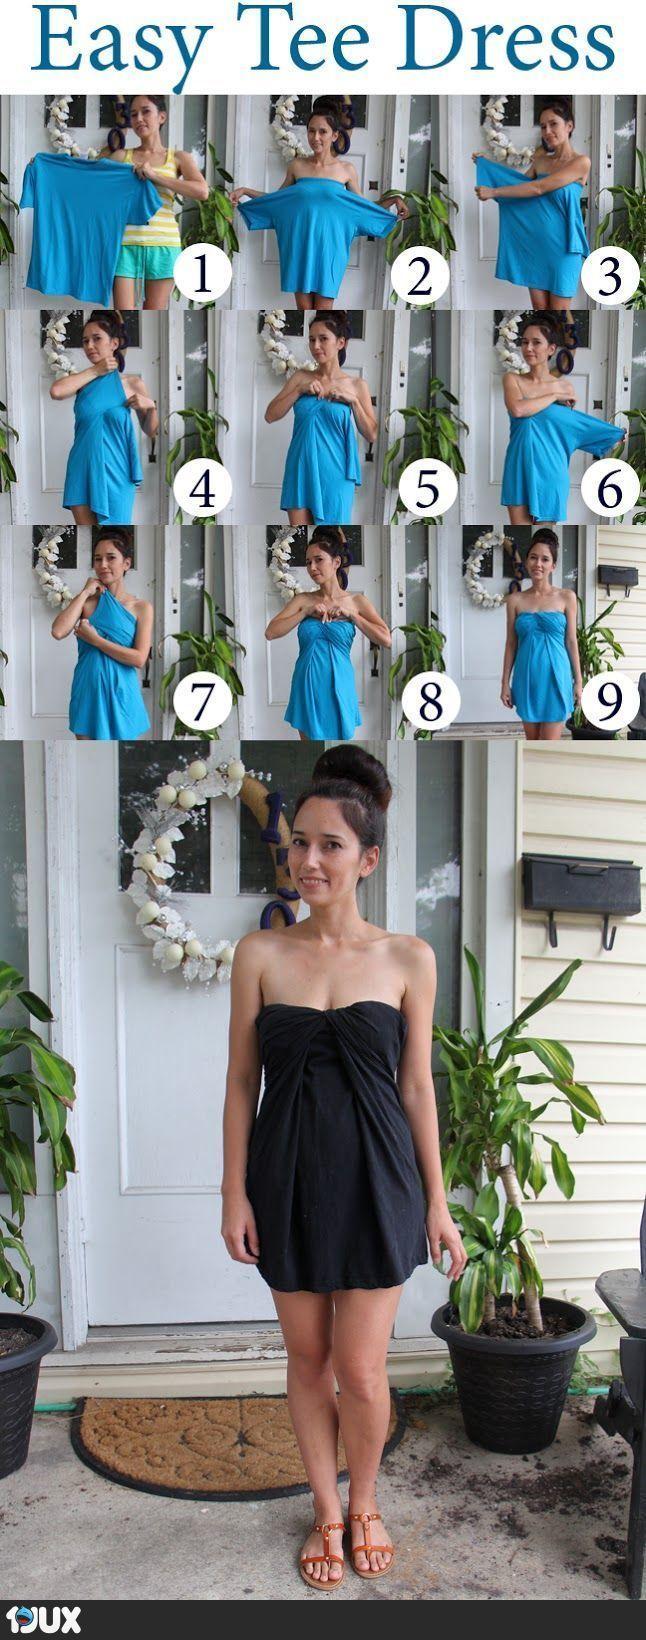 Easy Tee Dress :)